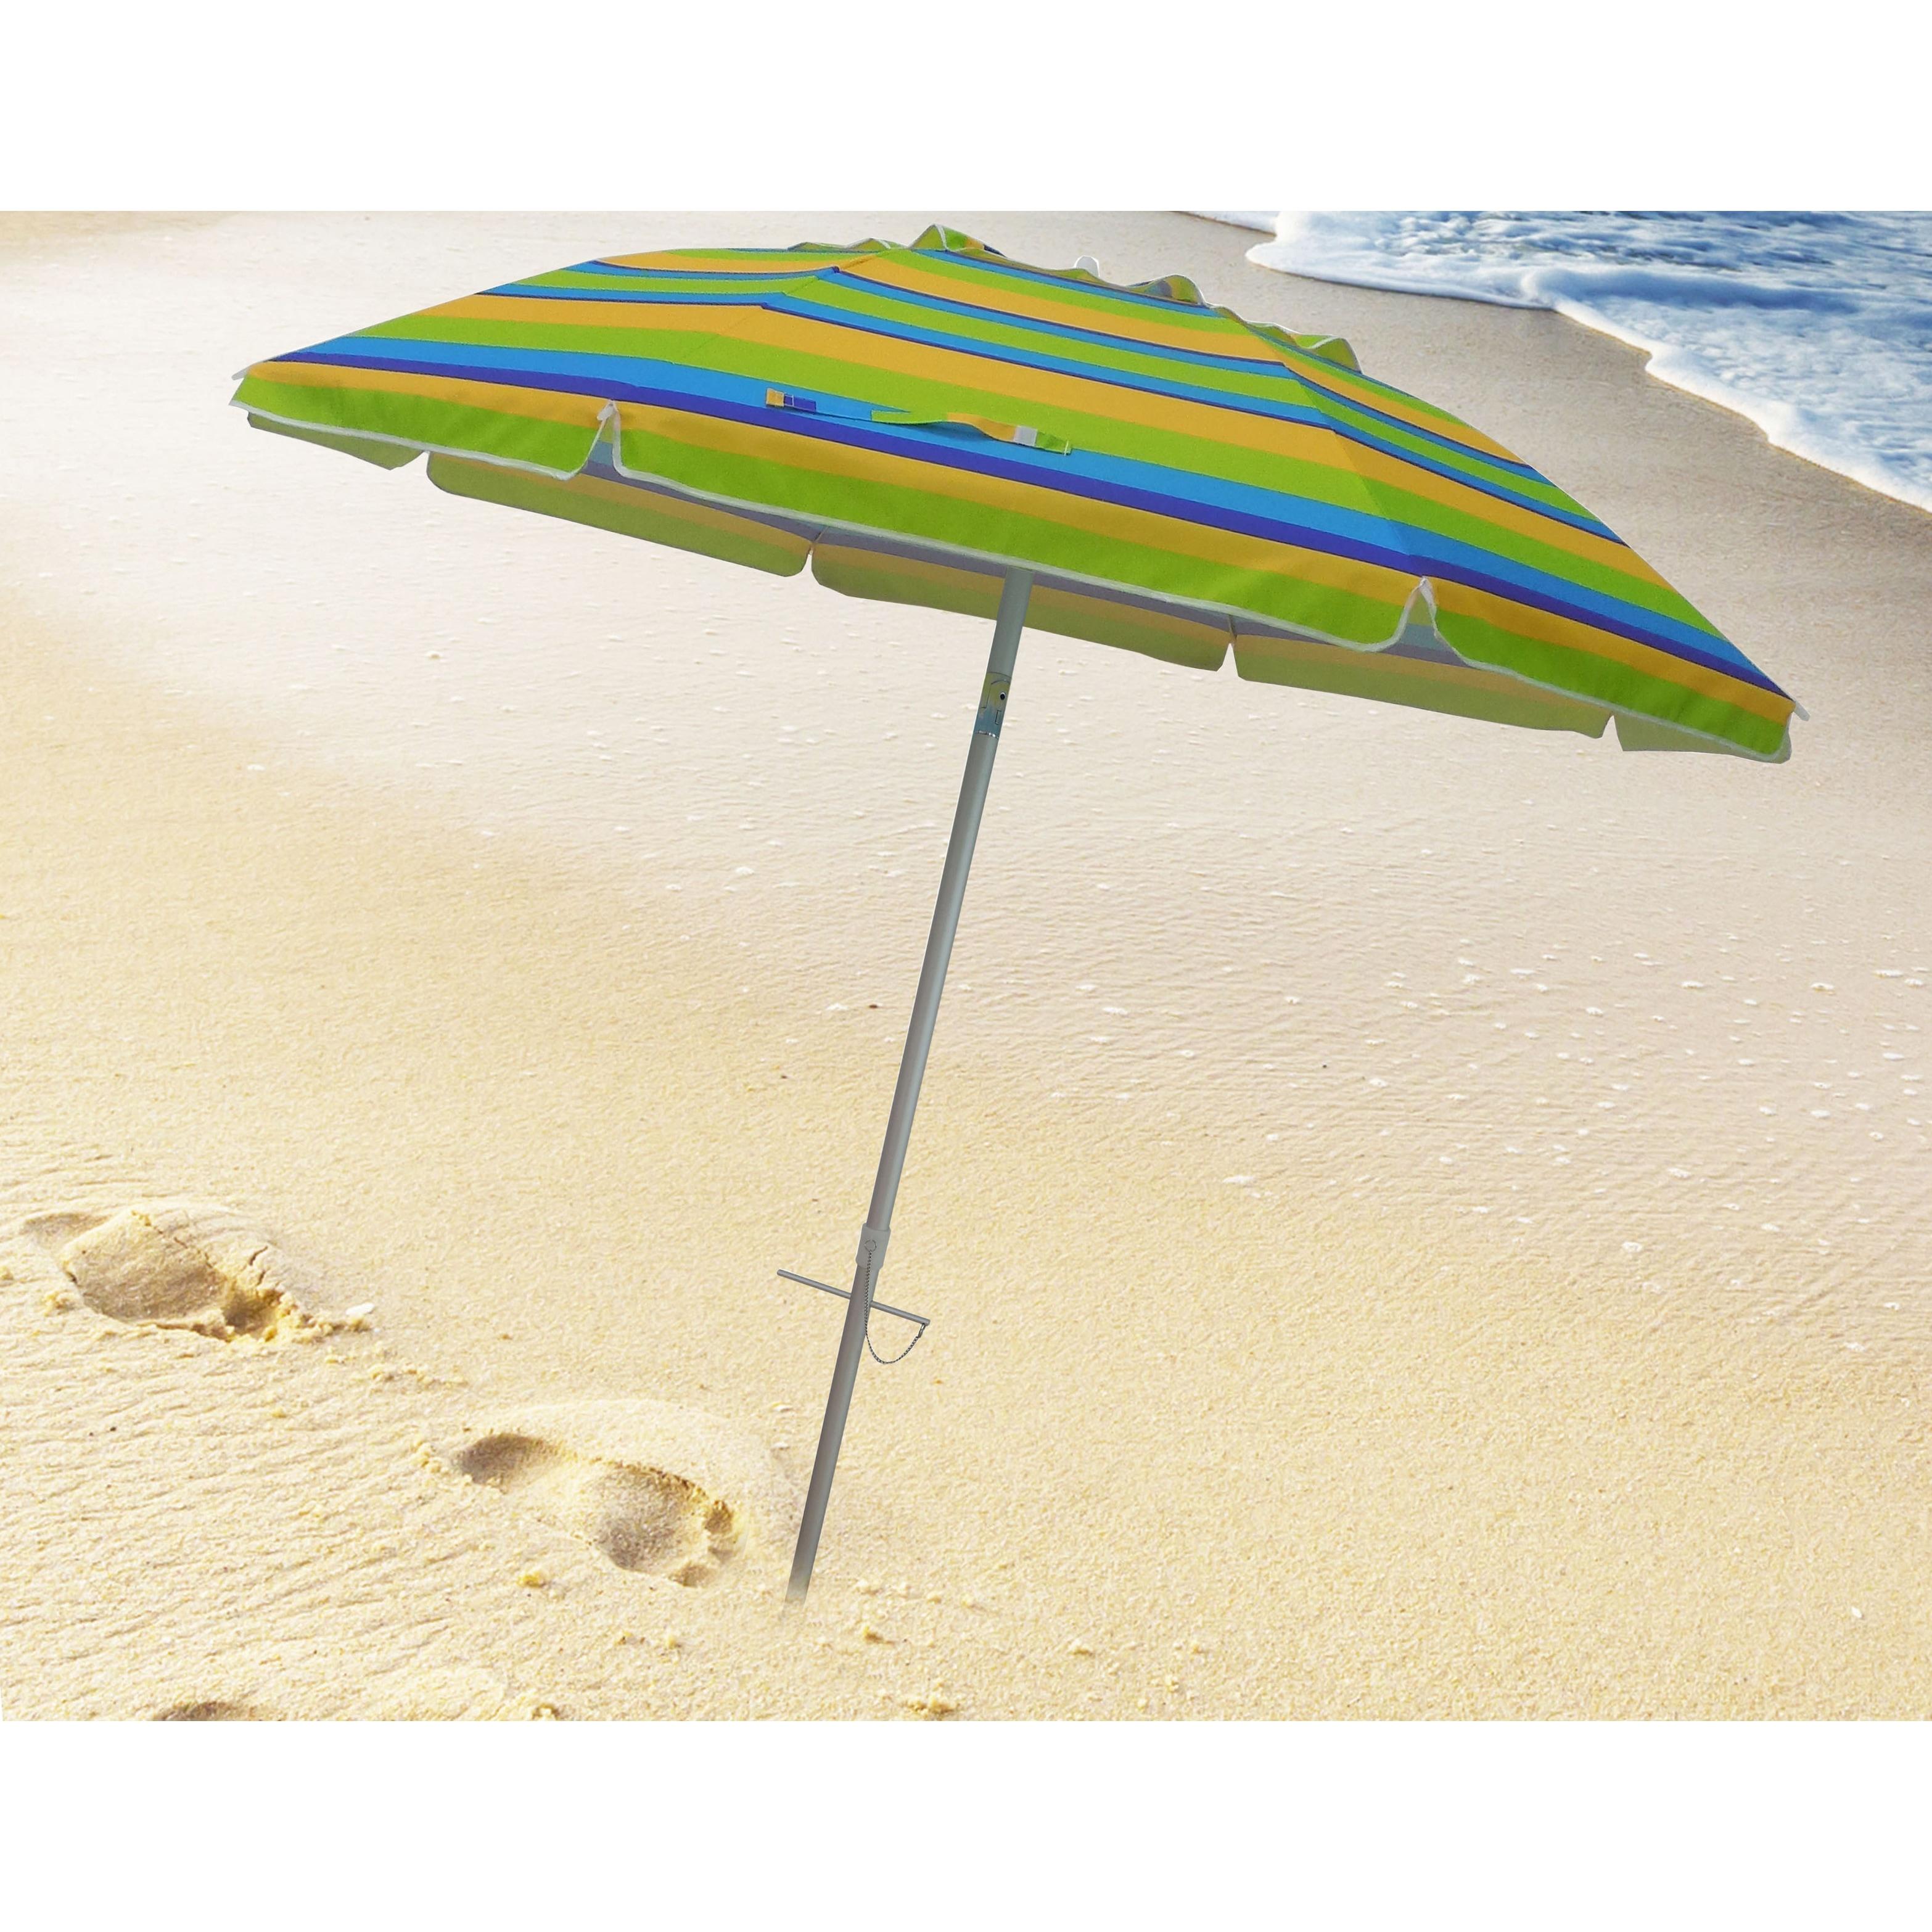 7 Foot Stripe Beach Umbrellas With Tilt And Travel Bag